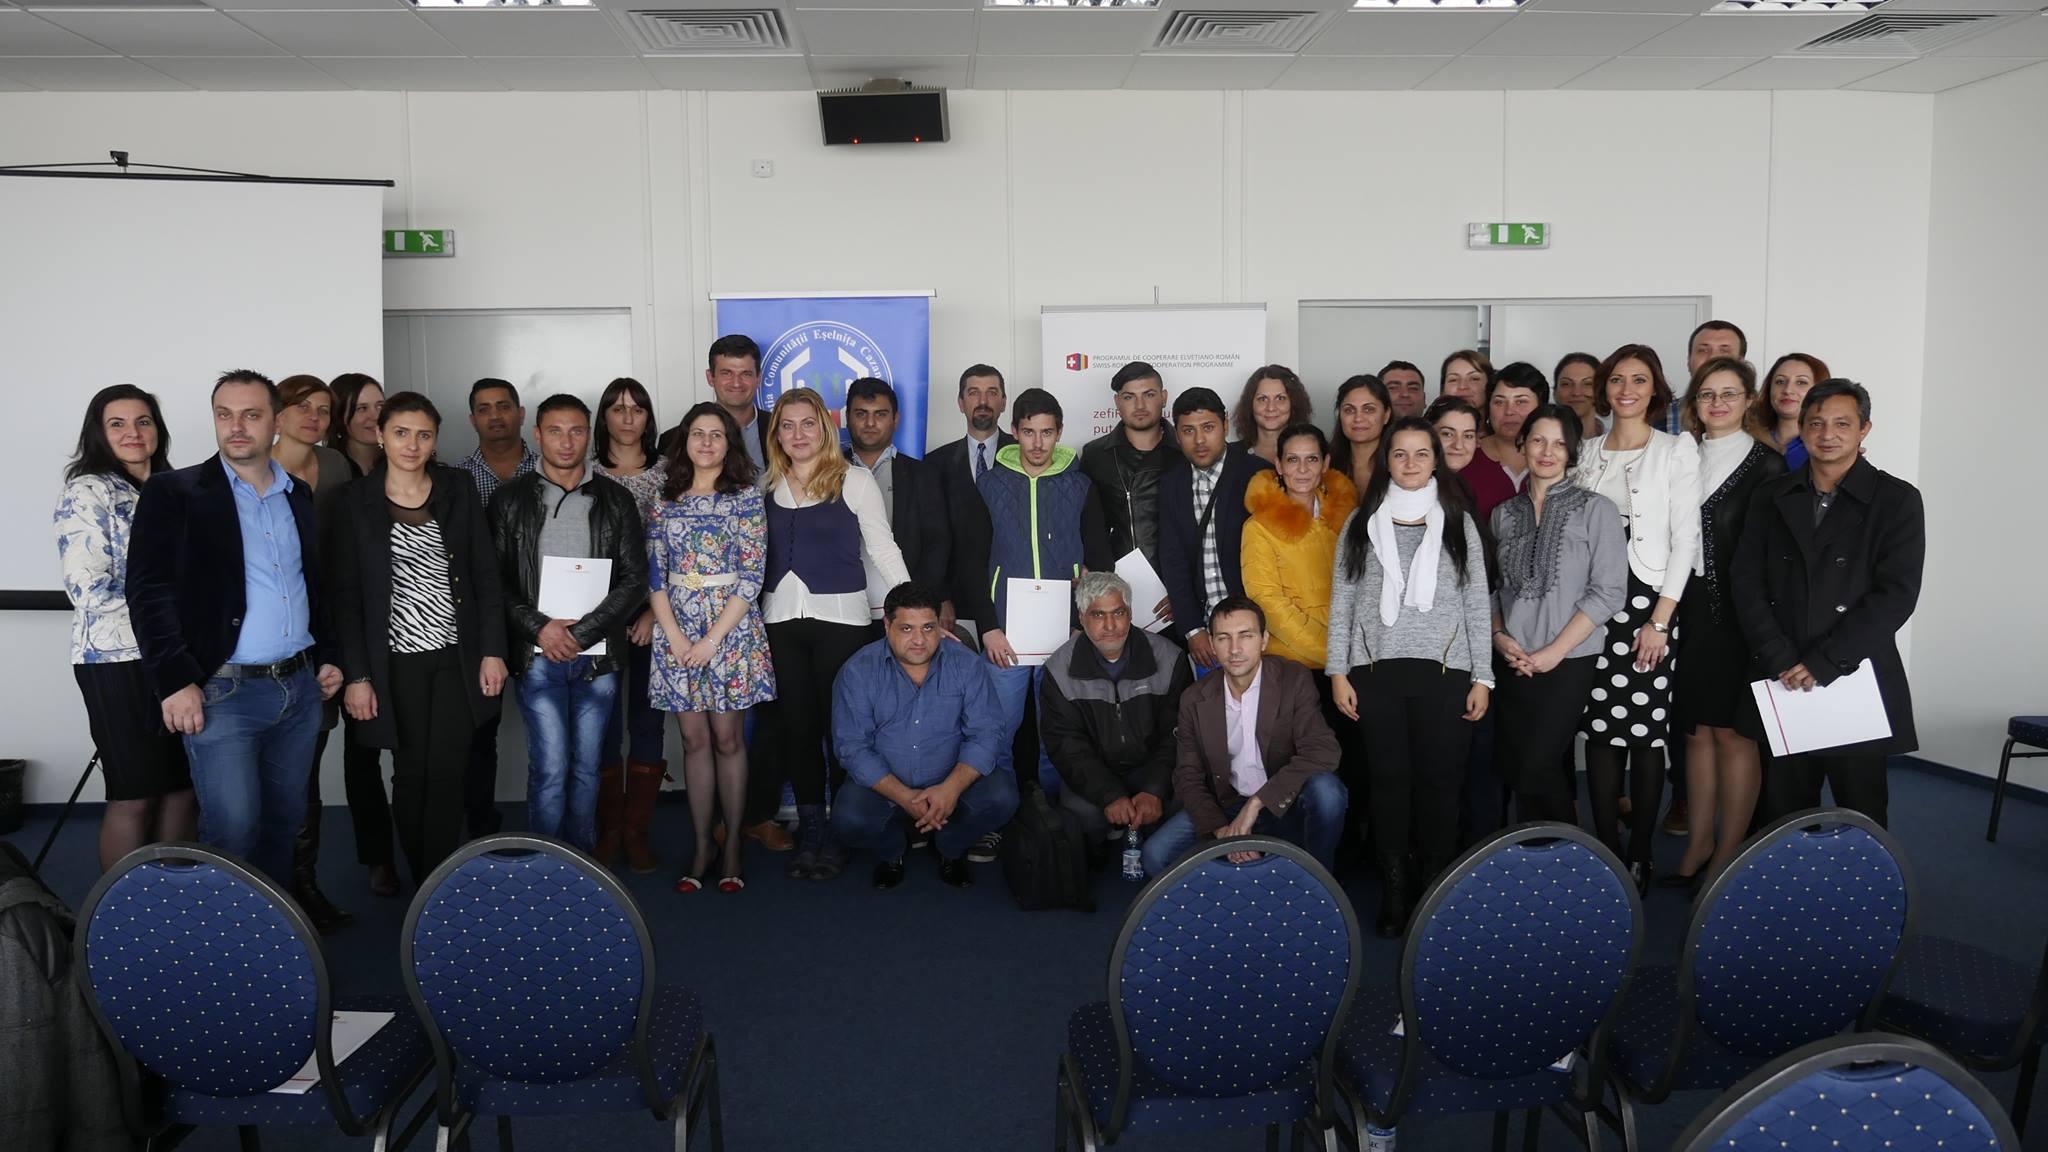 28 de antreprenori romi È™i din alte grupuri vulnerabile, finanÈ›aÈ›i cu peste 160.000 de franci elveÈ›ieni